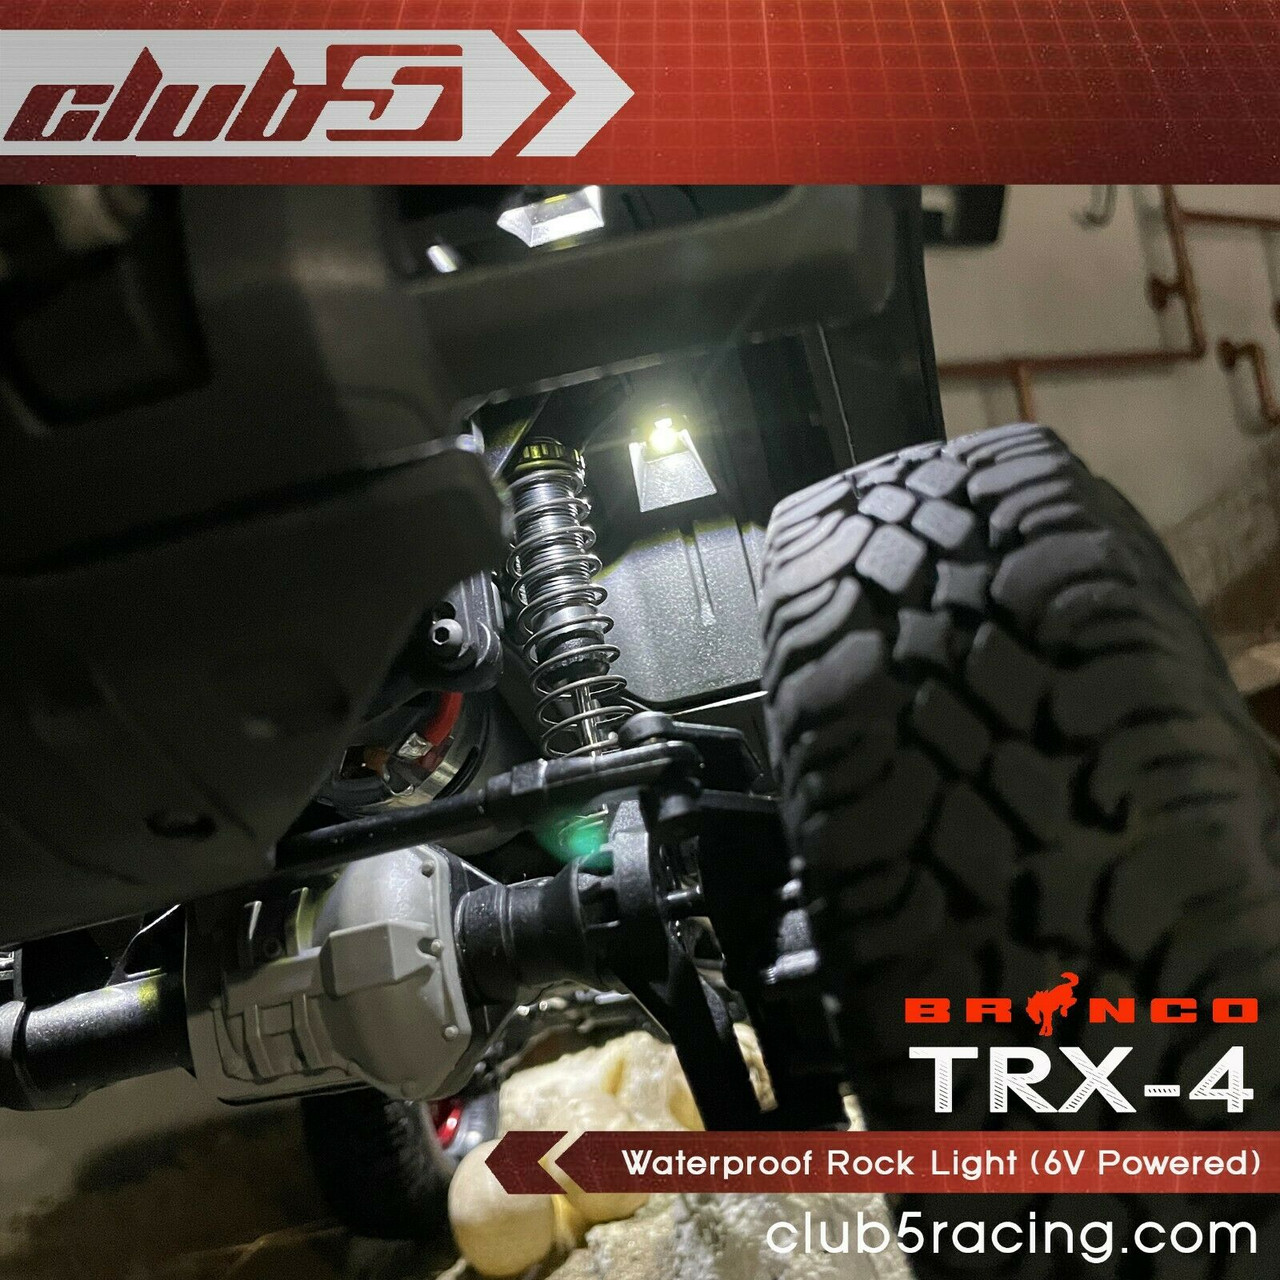 Waterproof Rock Light for TRX-4 2021 Bronco ( 6V Powered )